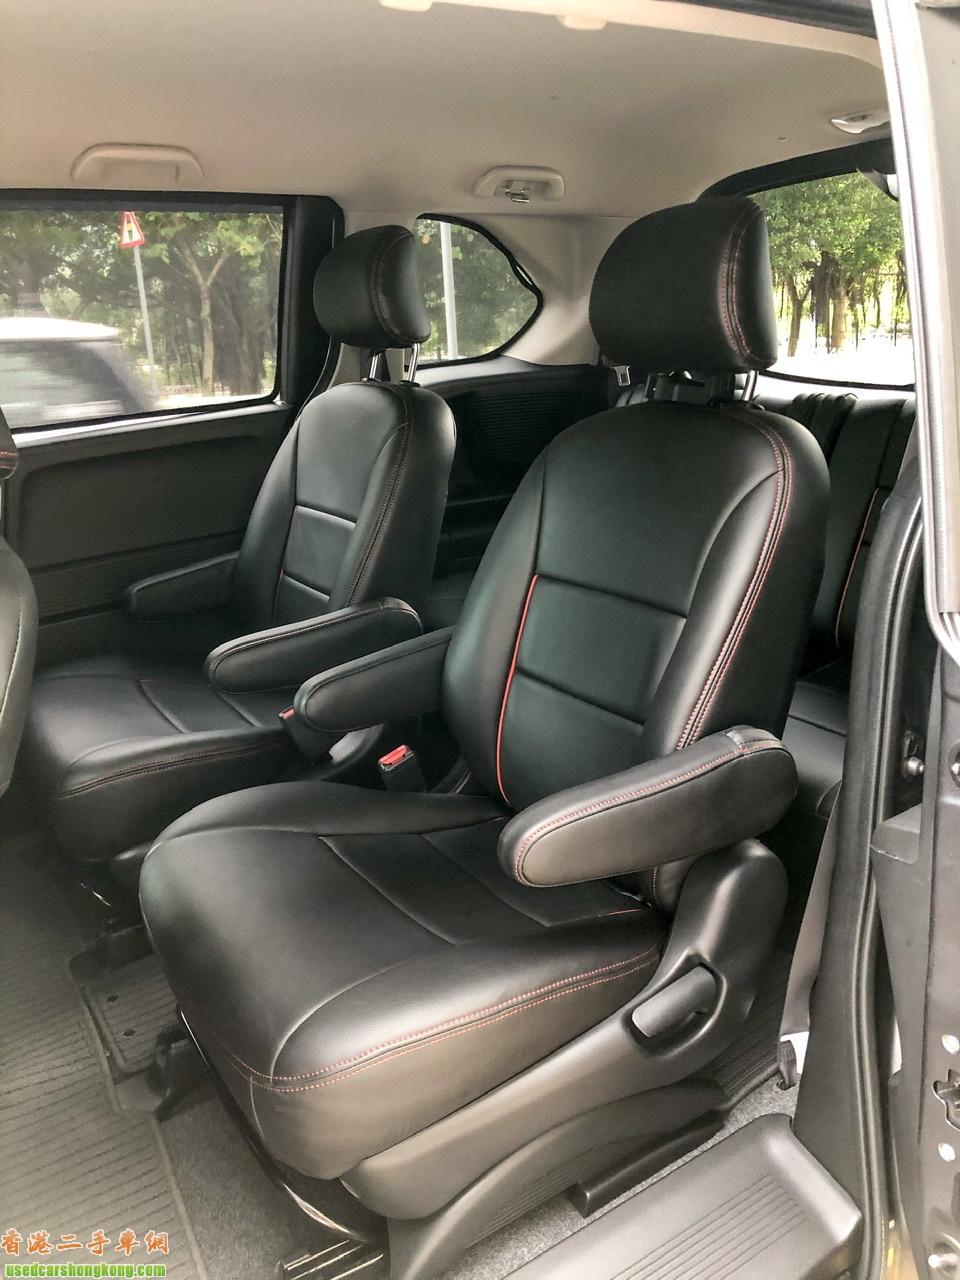 2012 Honda Freed 二手車出售 香港 Honda Freed 二手車易手車 - 香港二手車網